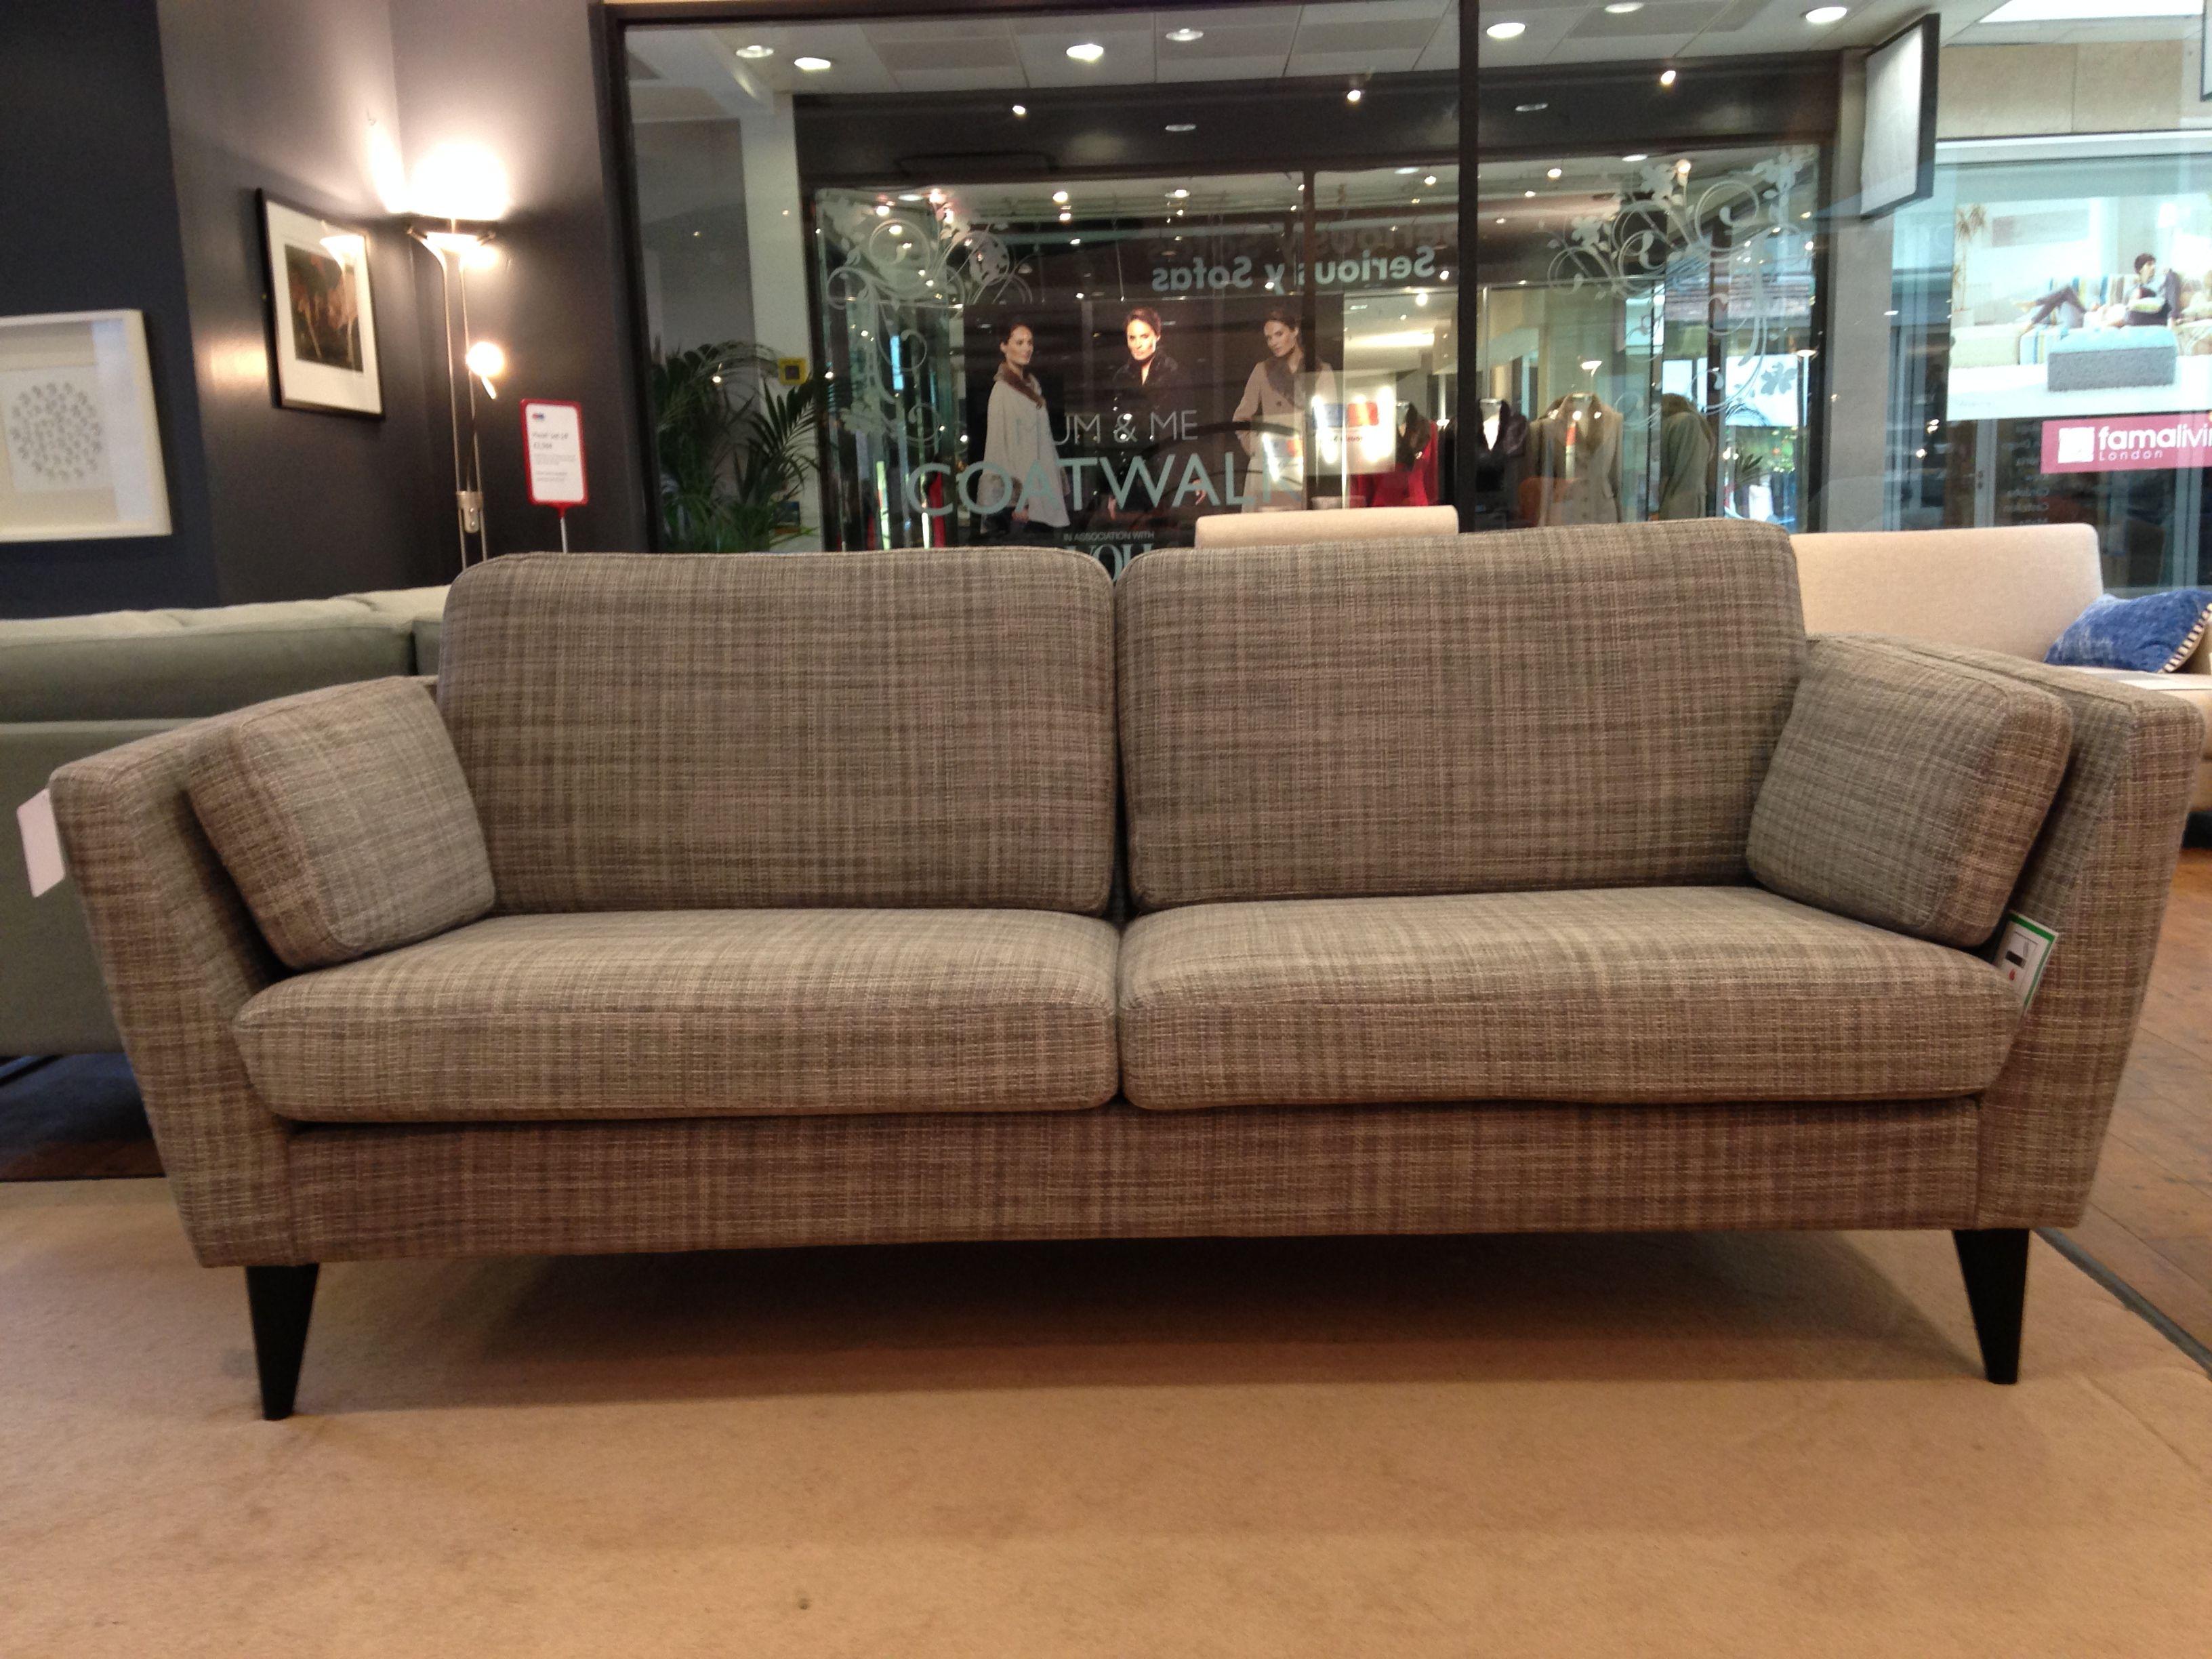 Our retro look sofa jasmine showroom display model is for Sofa 50 cm sitzhohe